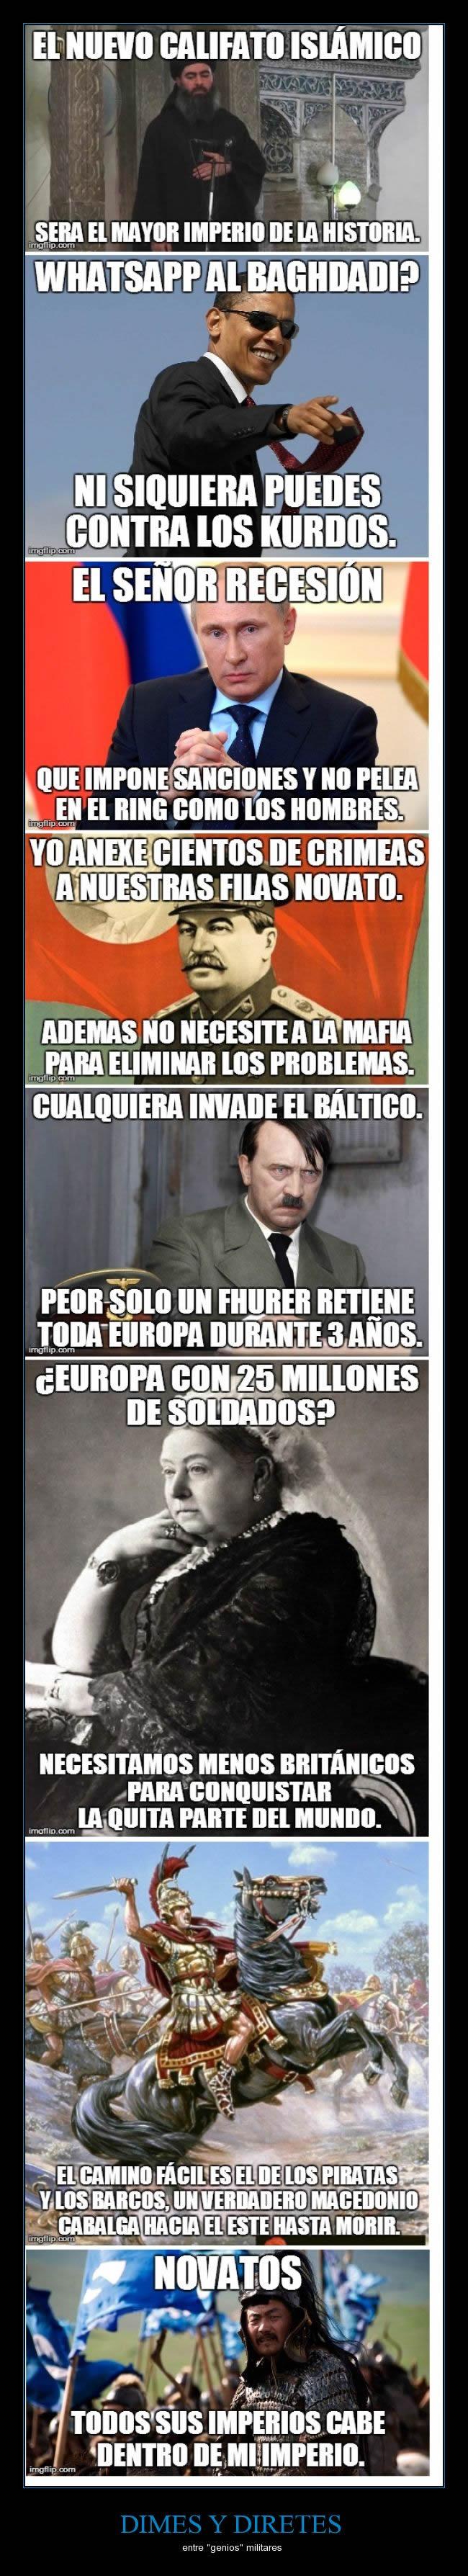 Marcianadas_162_16ene15 (242)